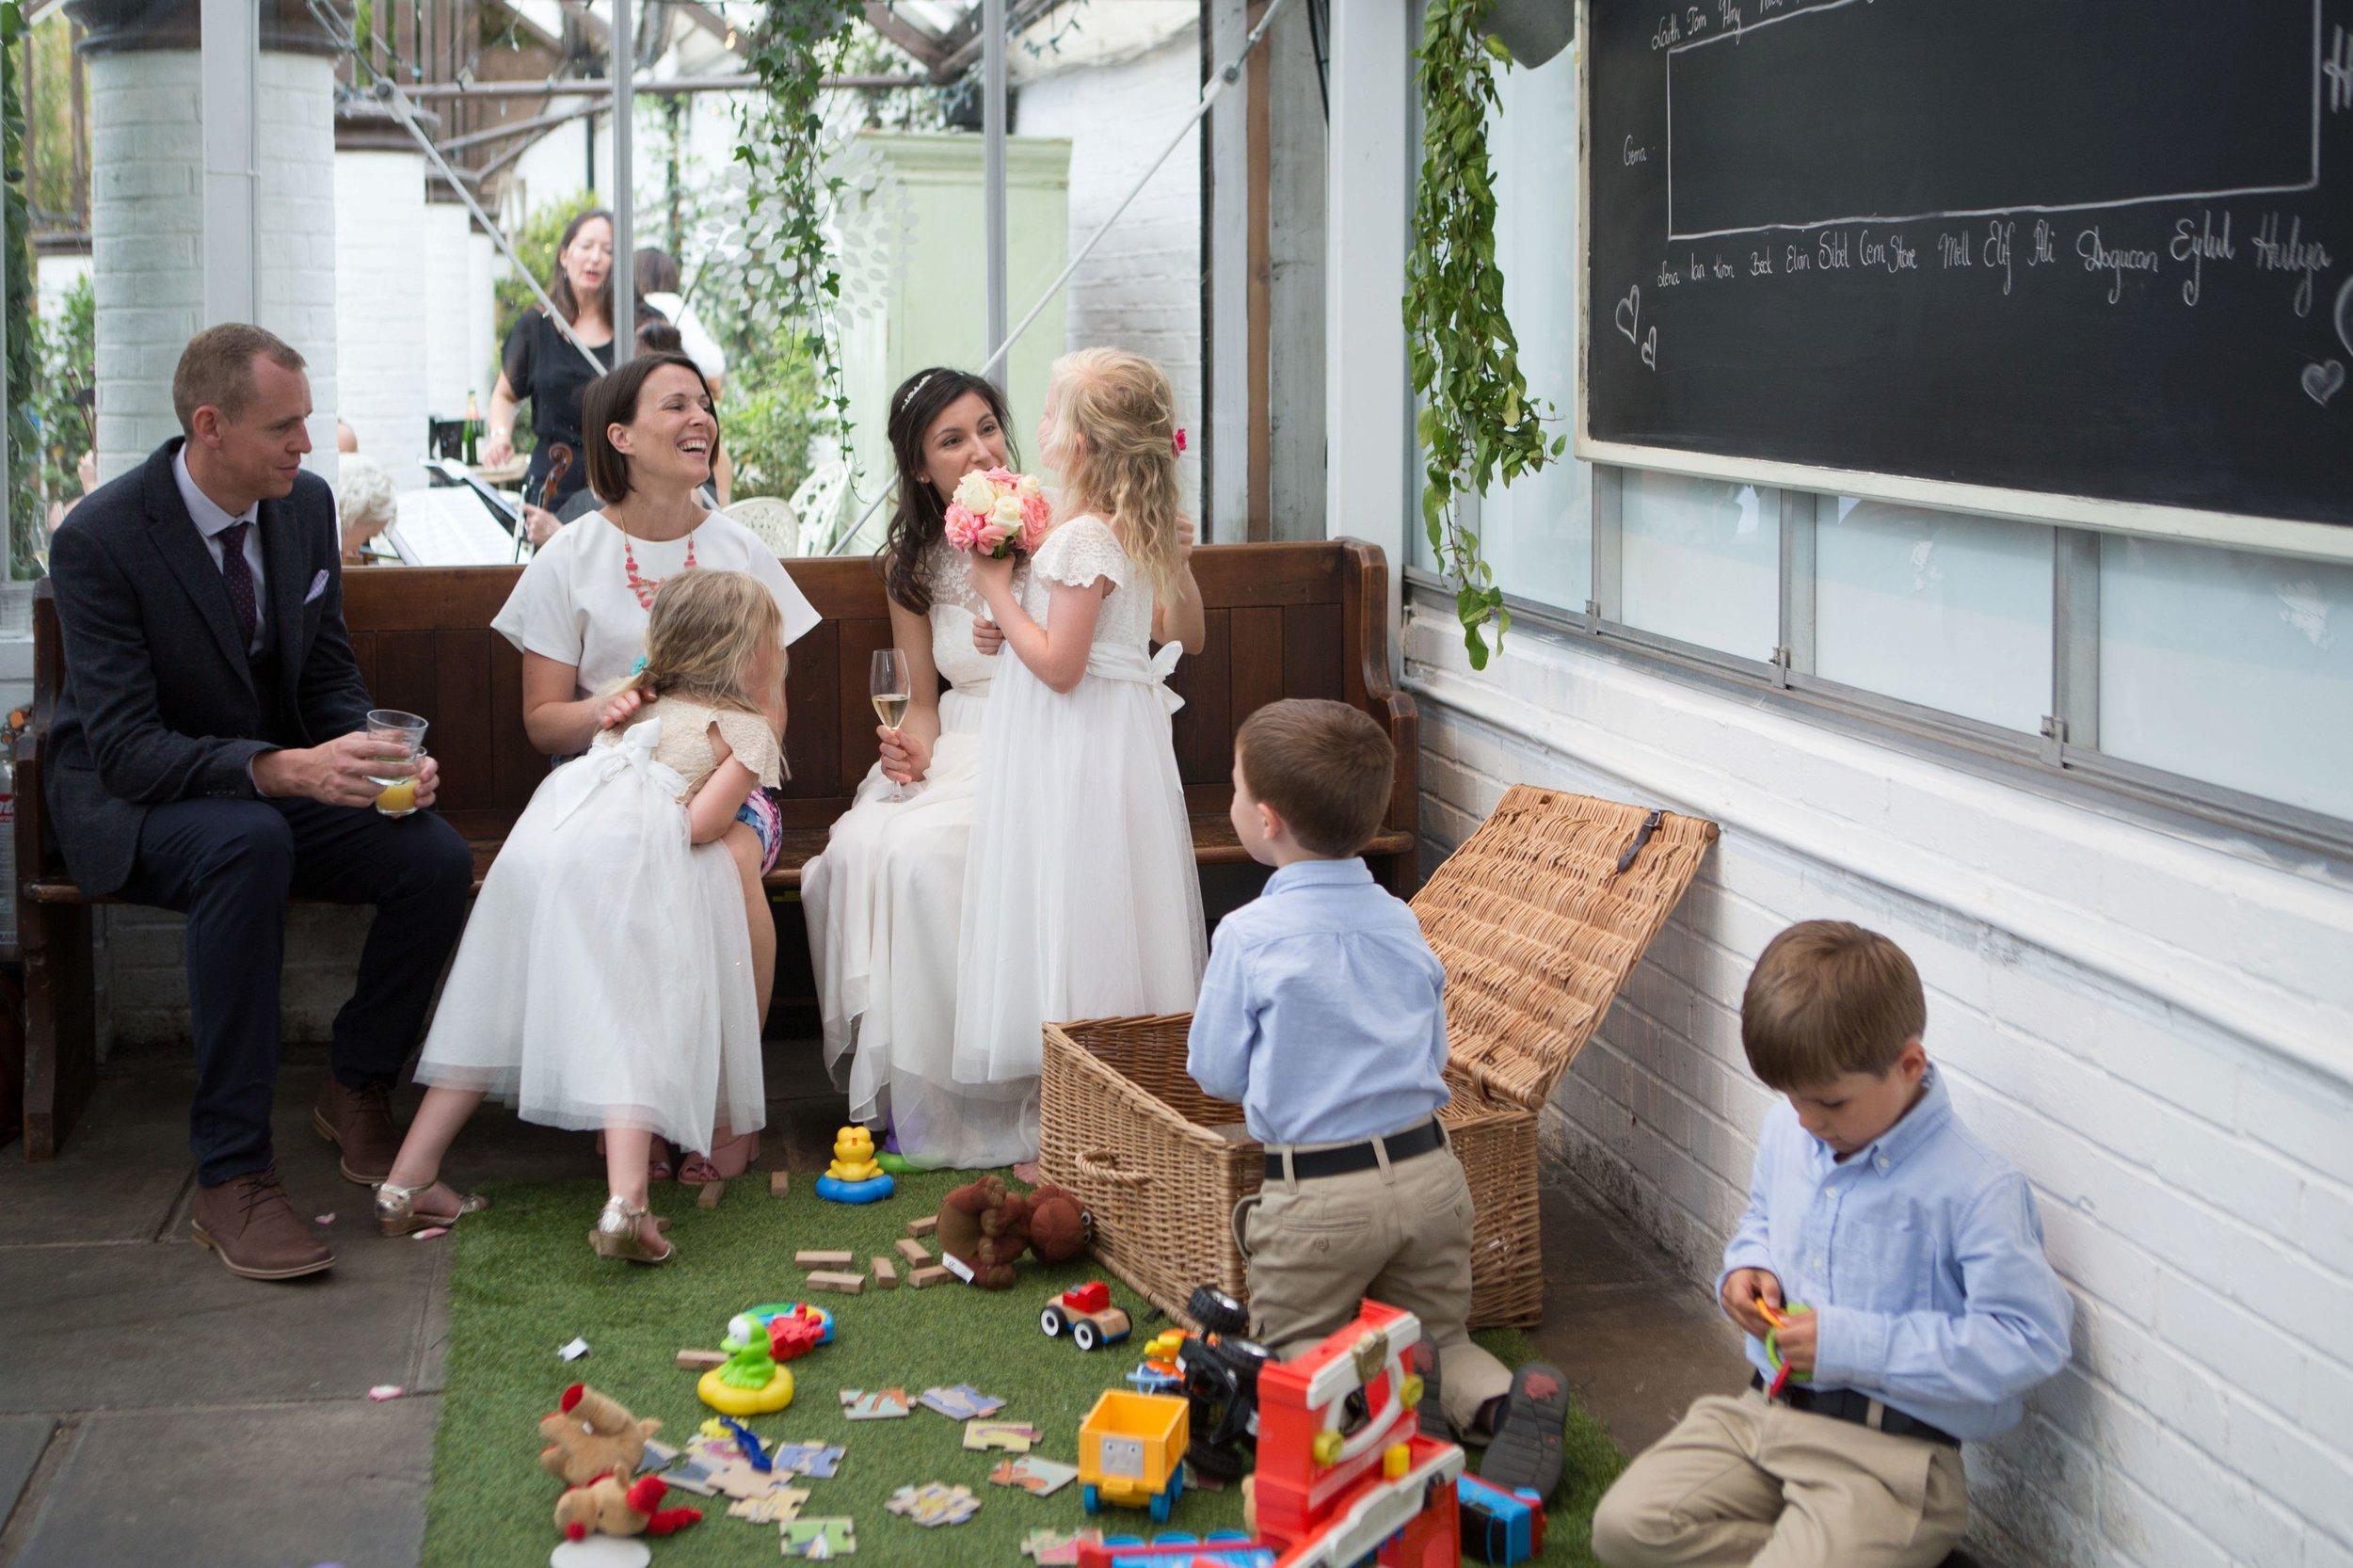 Hulya_&_Ben's_Clifton_Nurseries_London_Wedding_0793.jpg